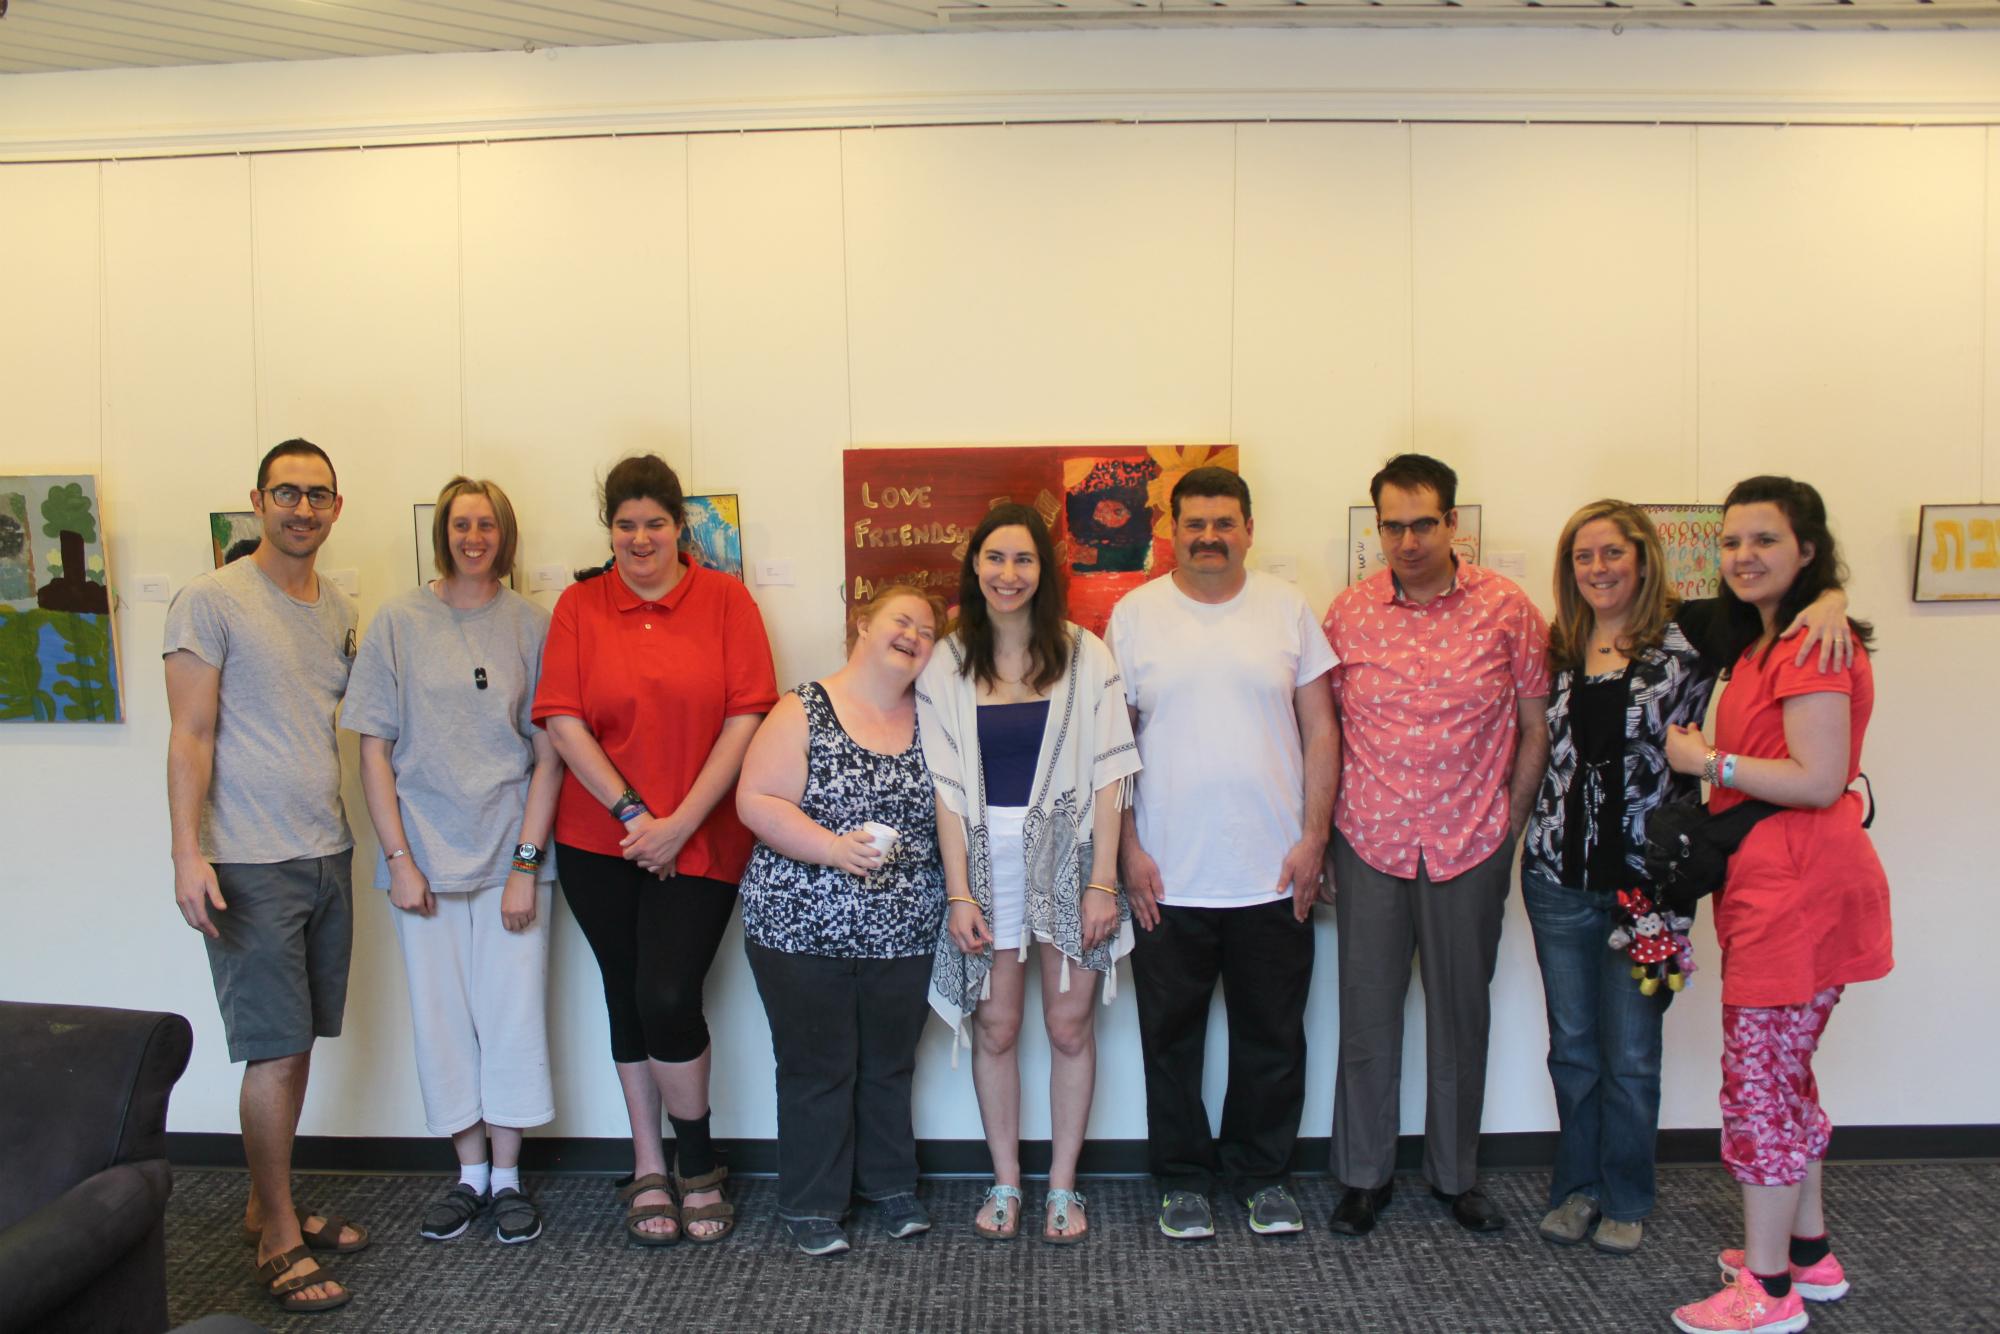 Inclusion Calgary Jewish Federation